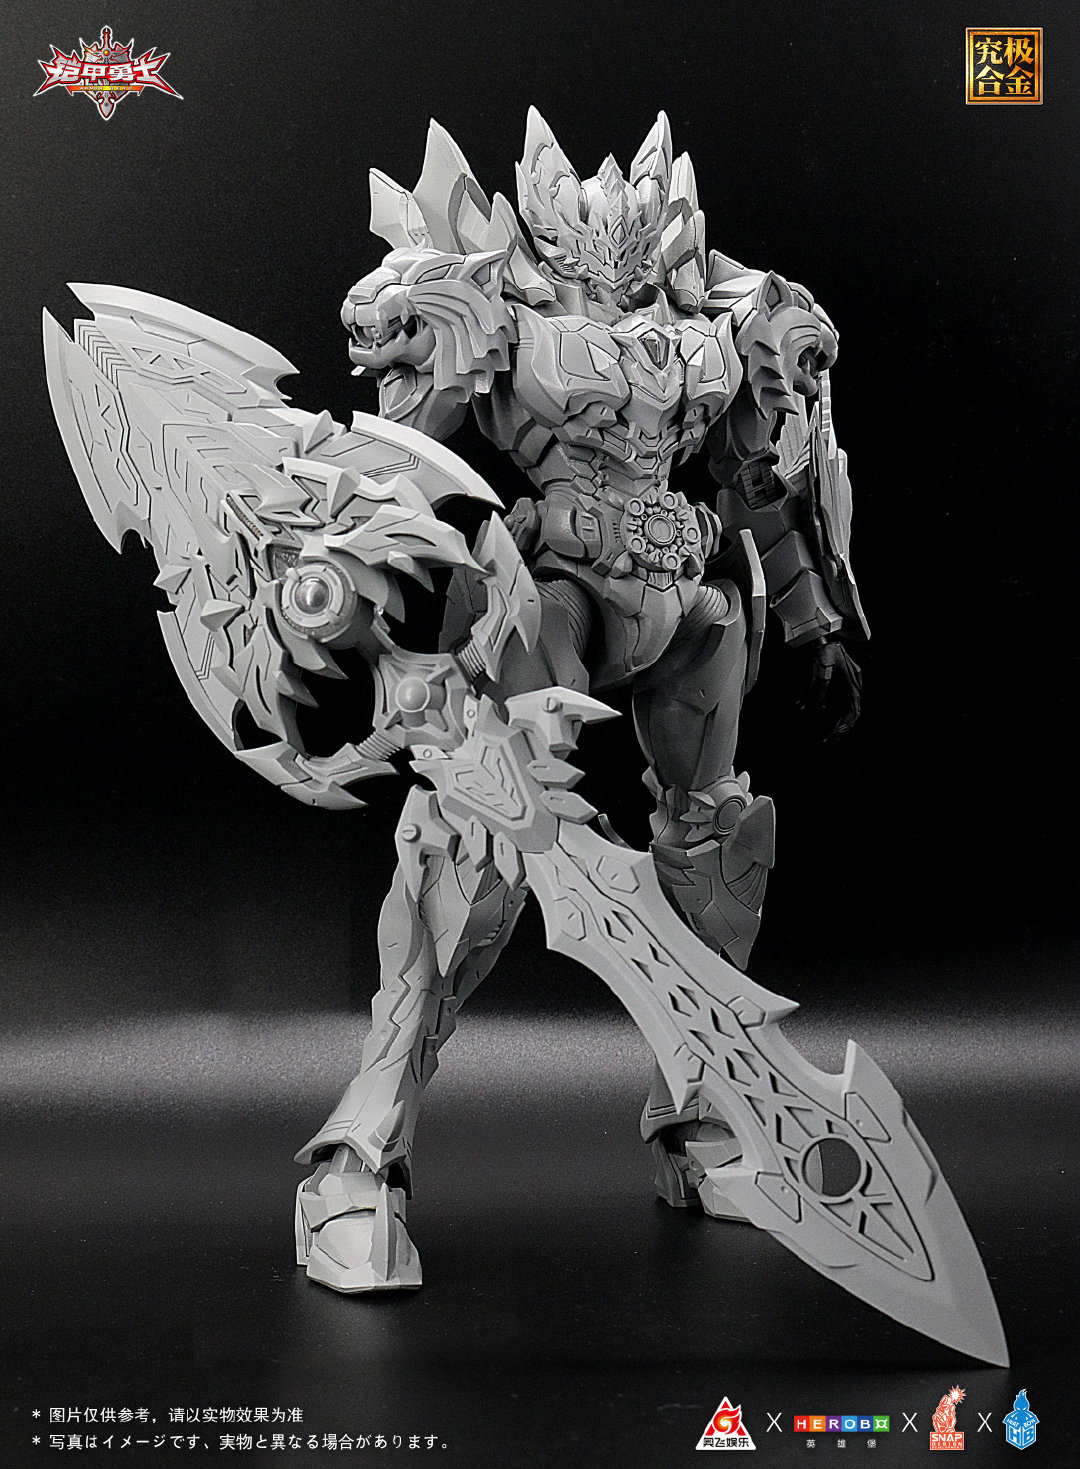 S535_Armor_hero_Emperor_010.jpg